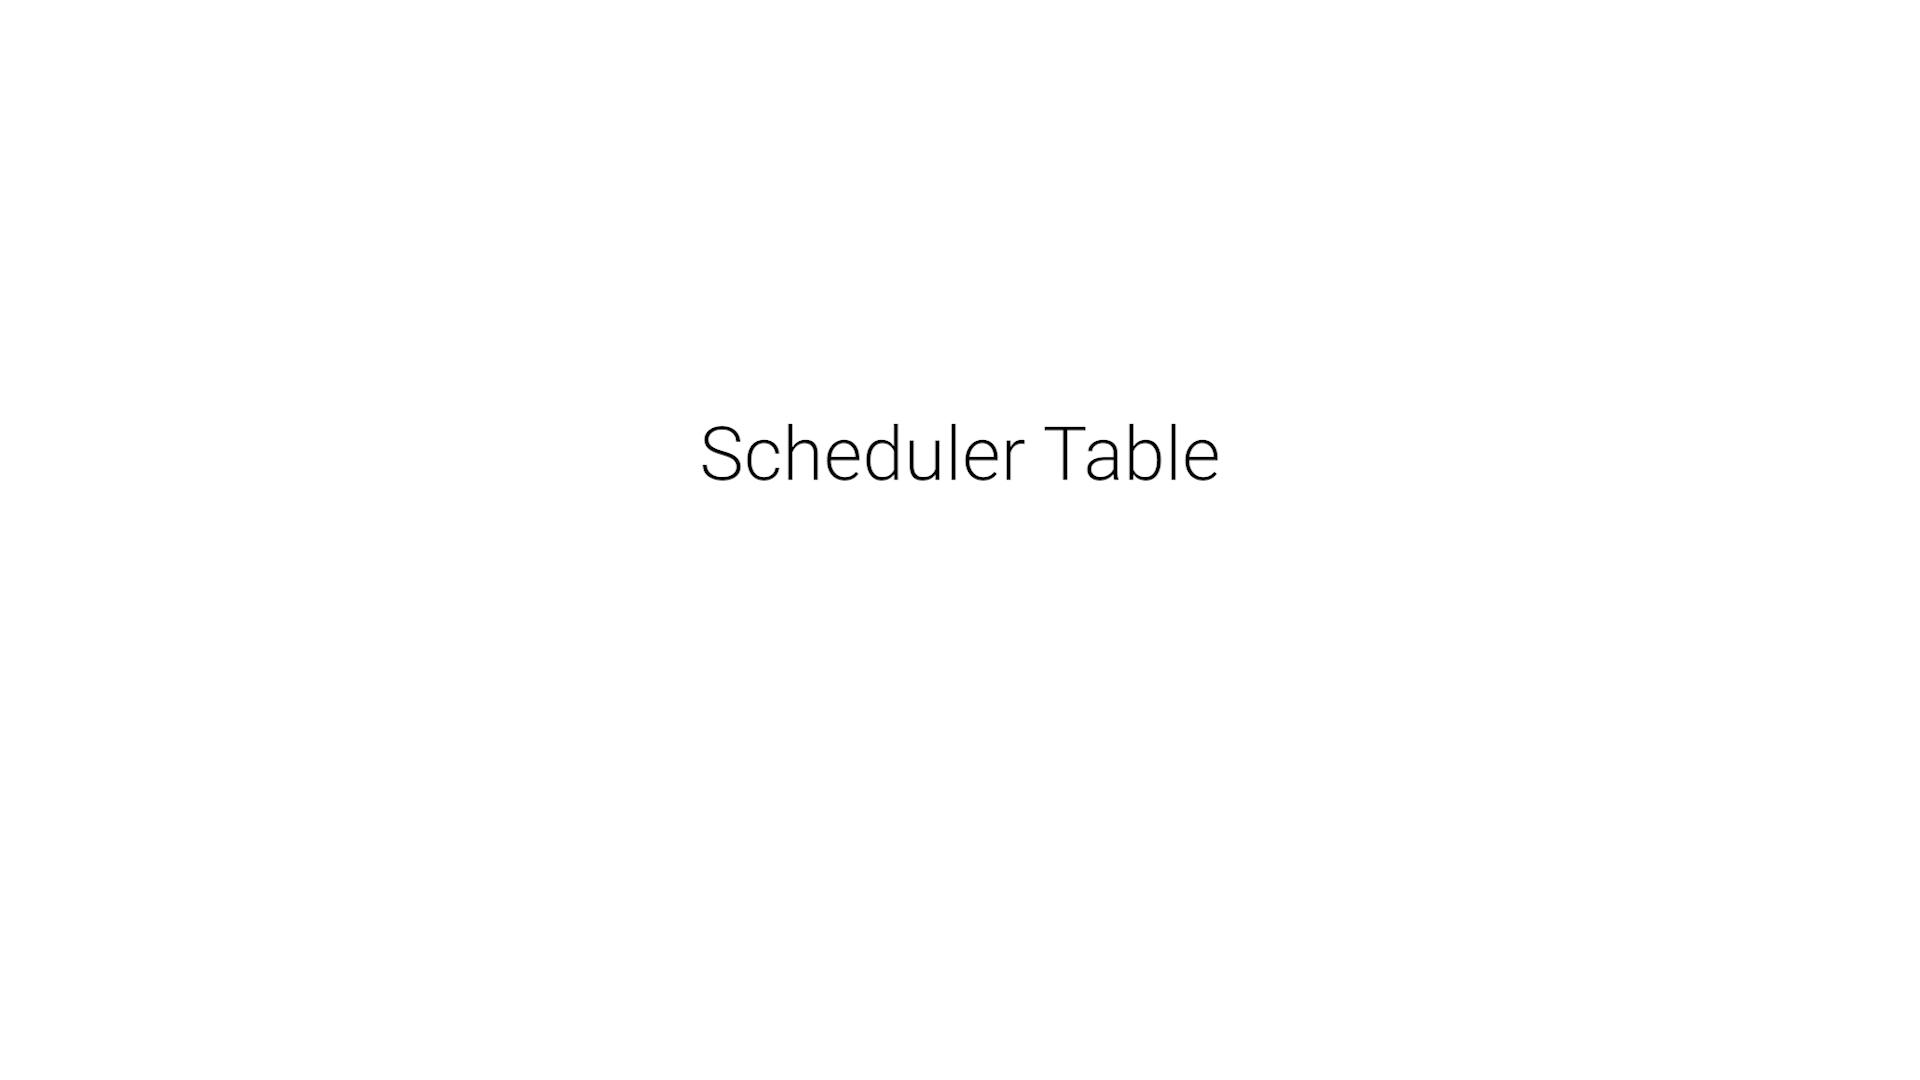 11_Scheduler_Table